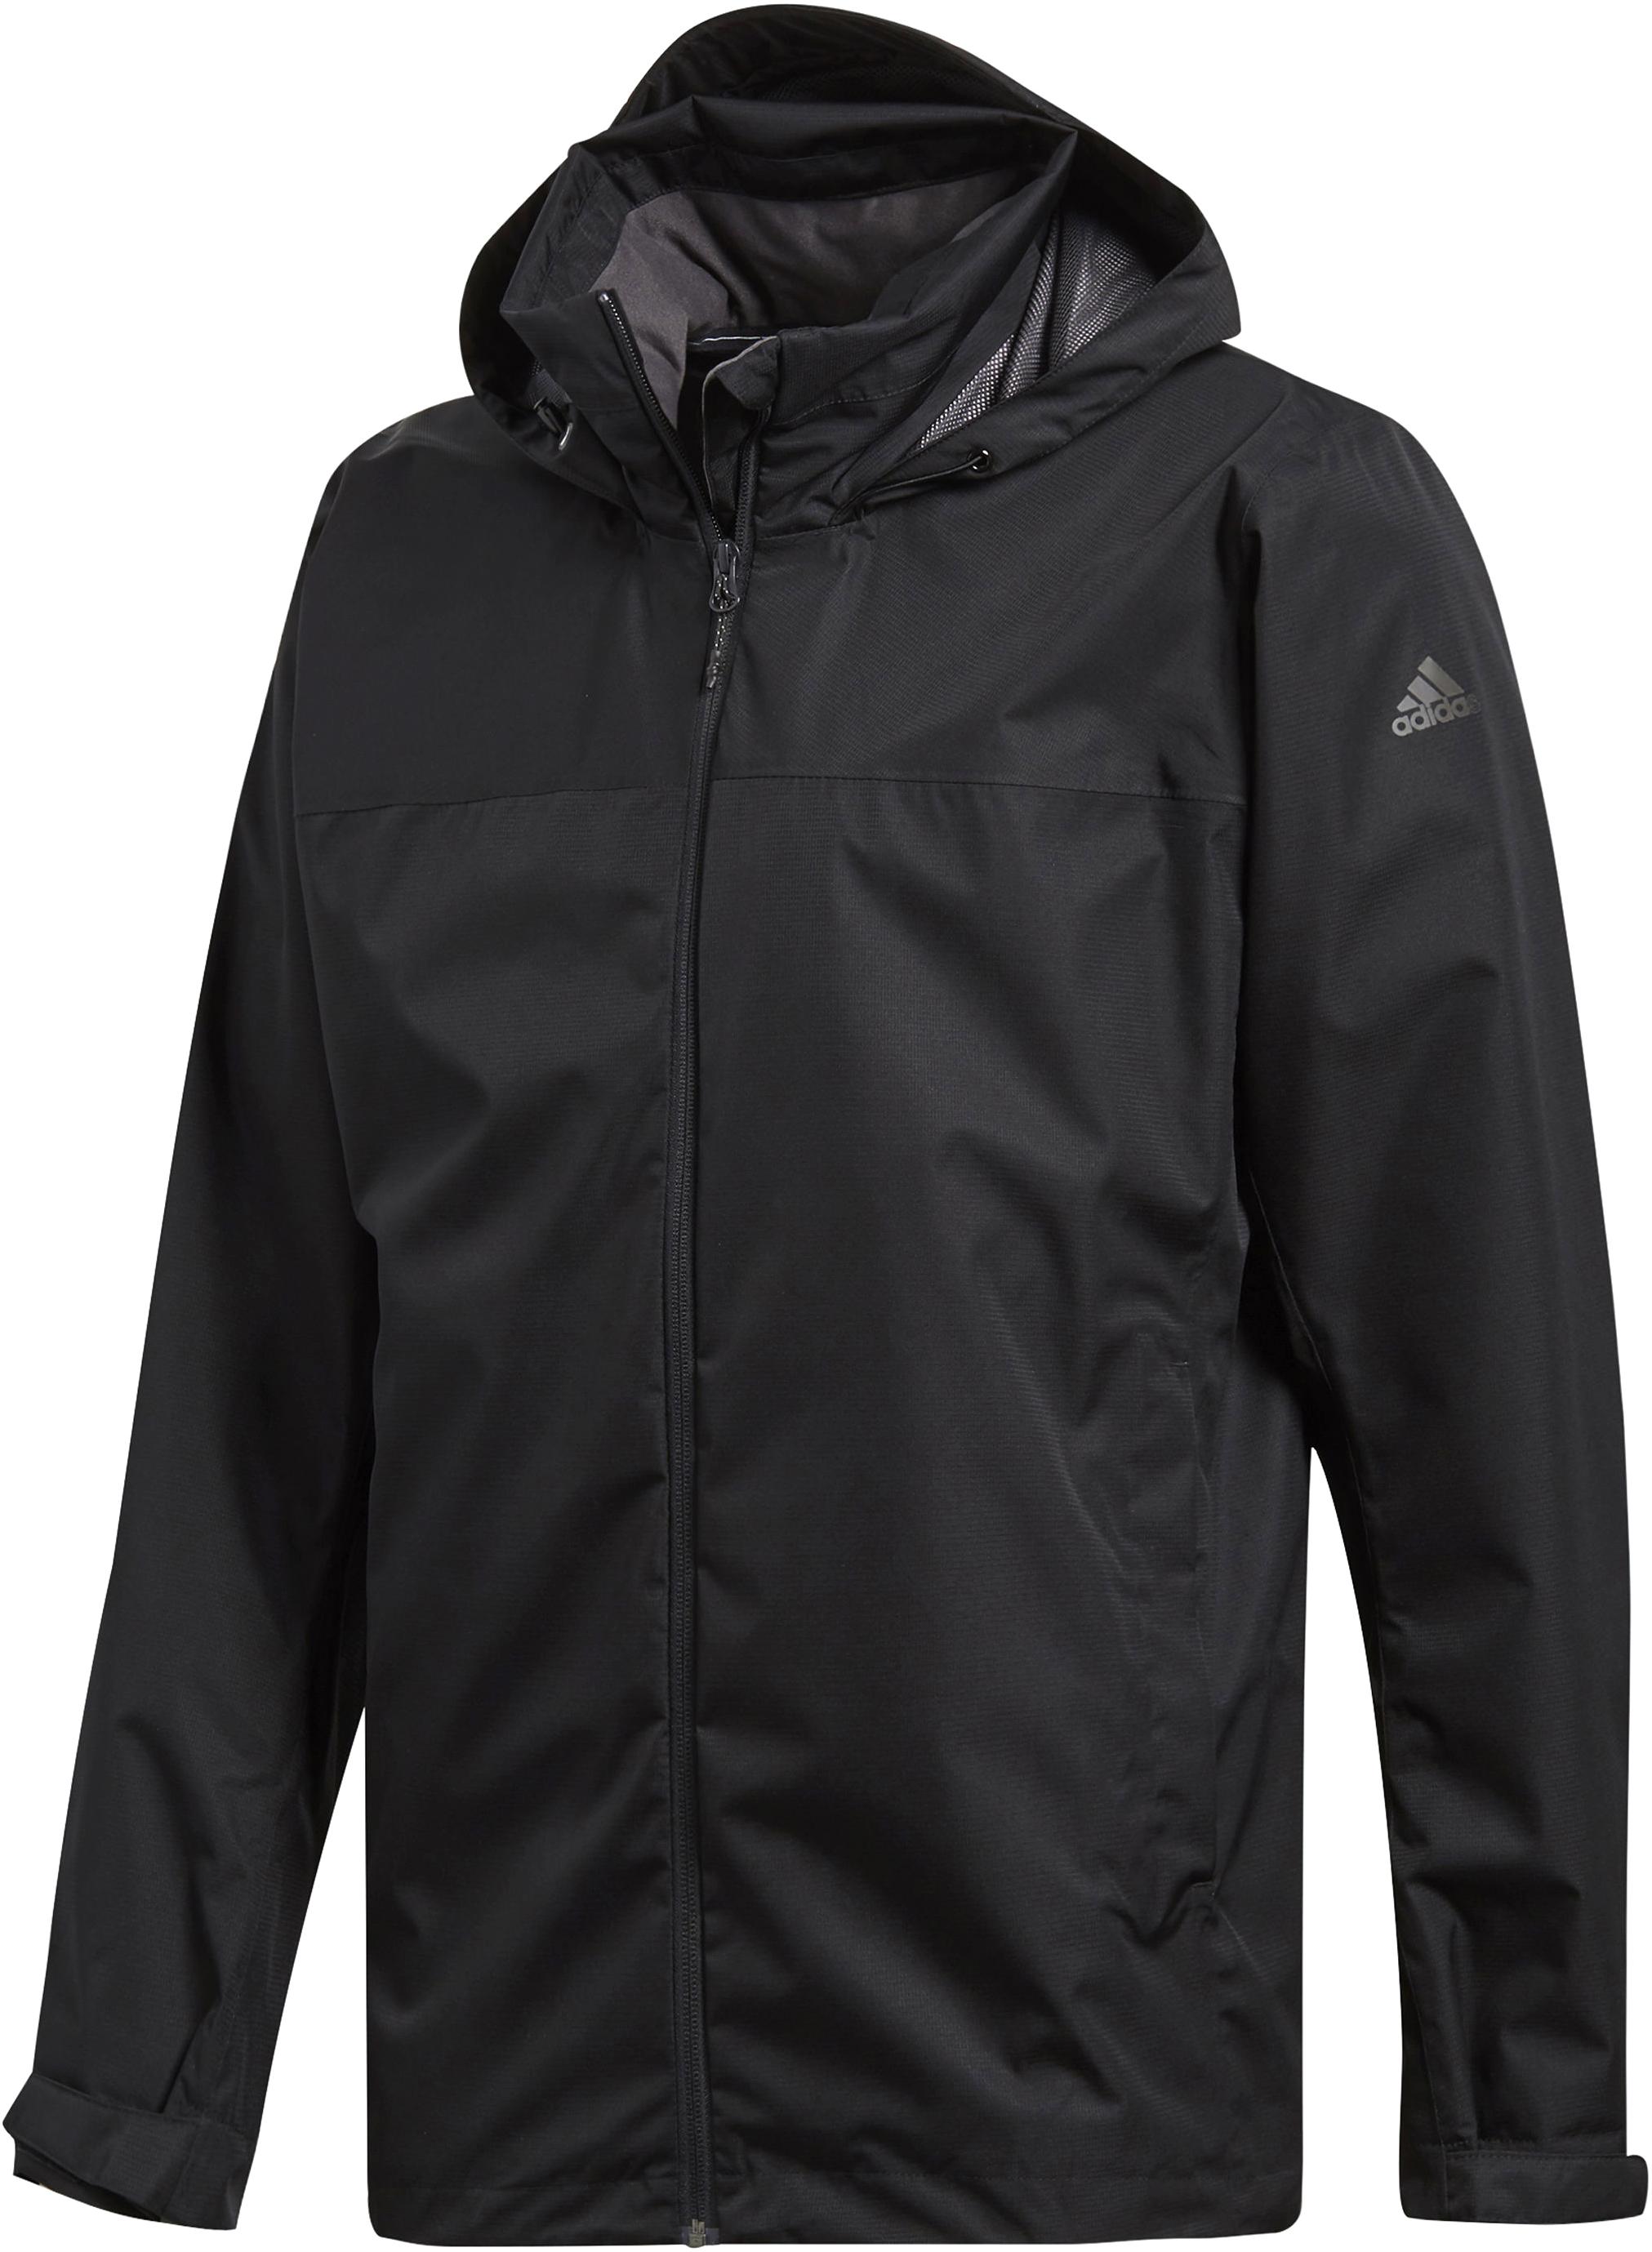 Adidas Outdoor Wandertag Insulated Jacket Men's